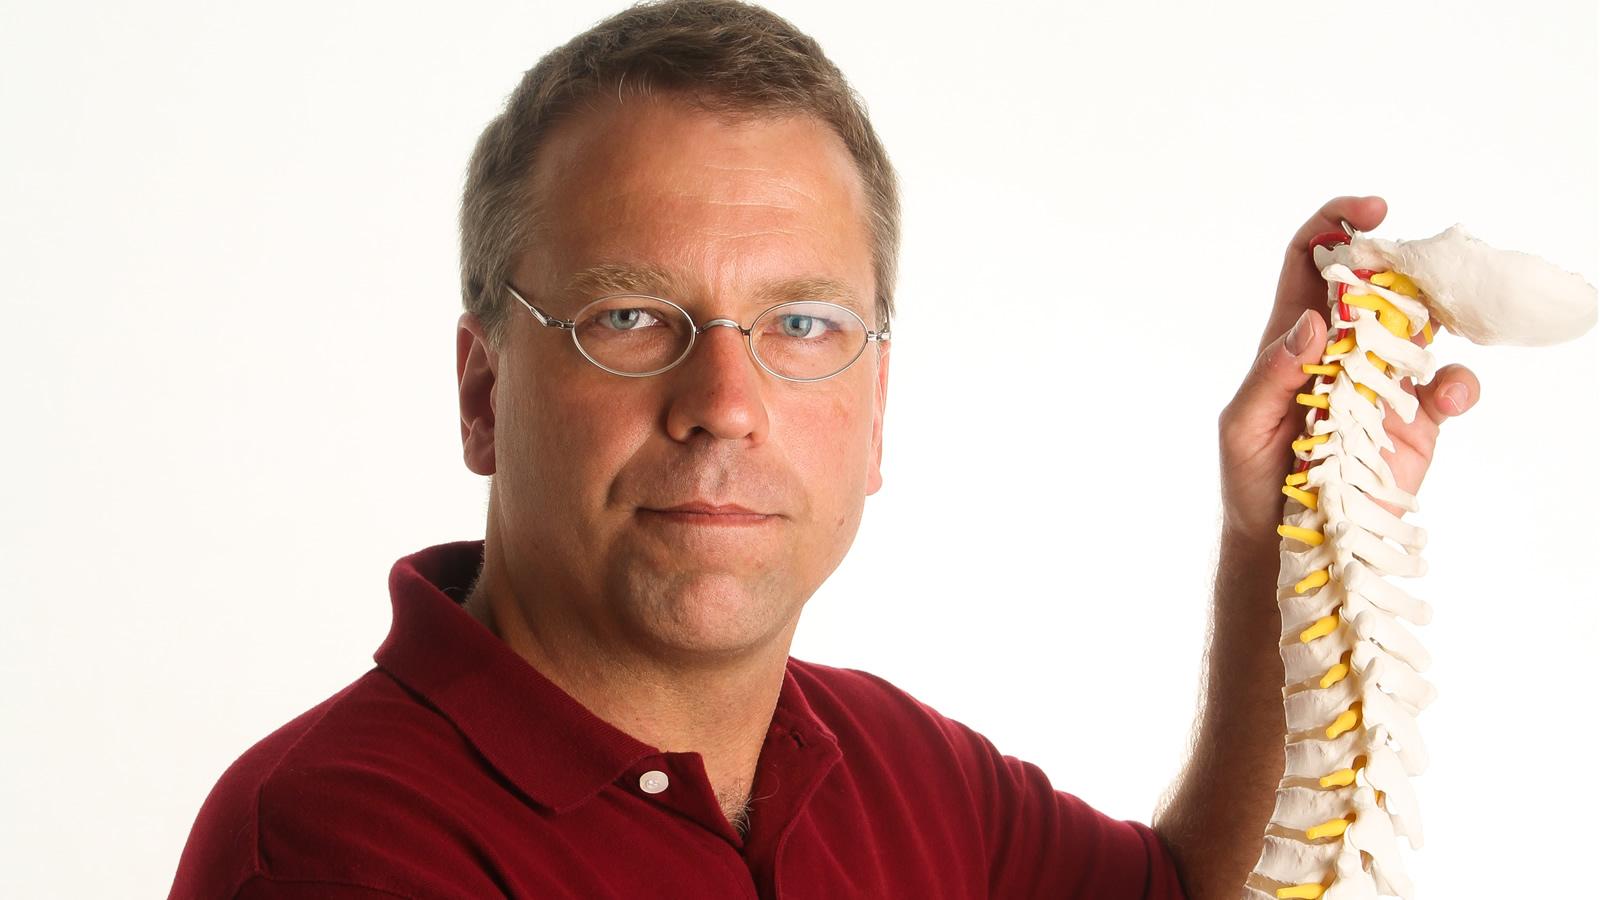 john harrysson kiropraktor